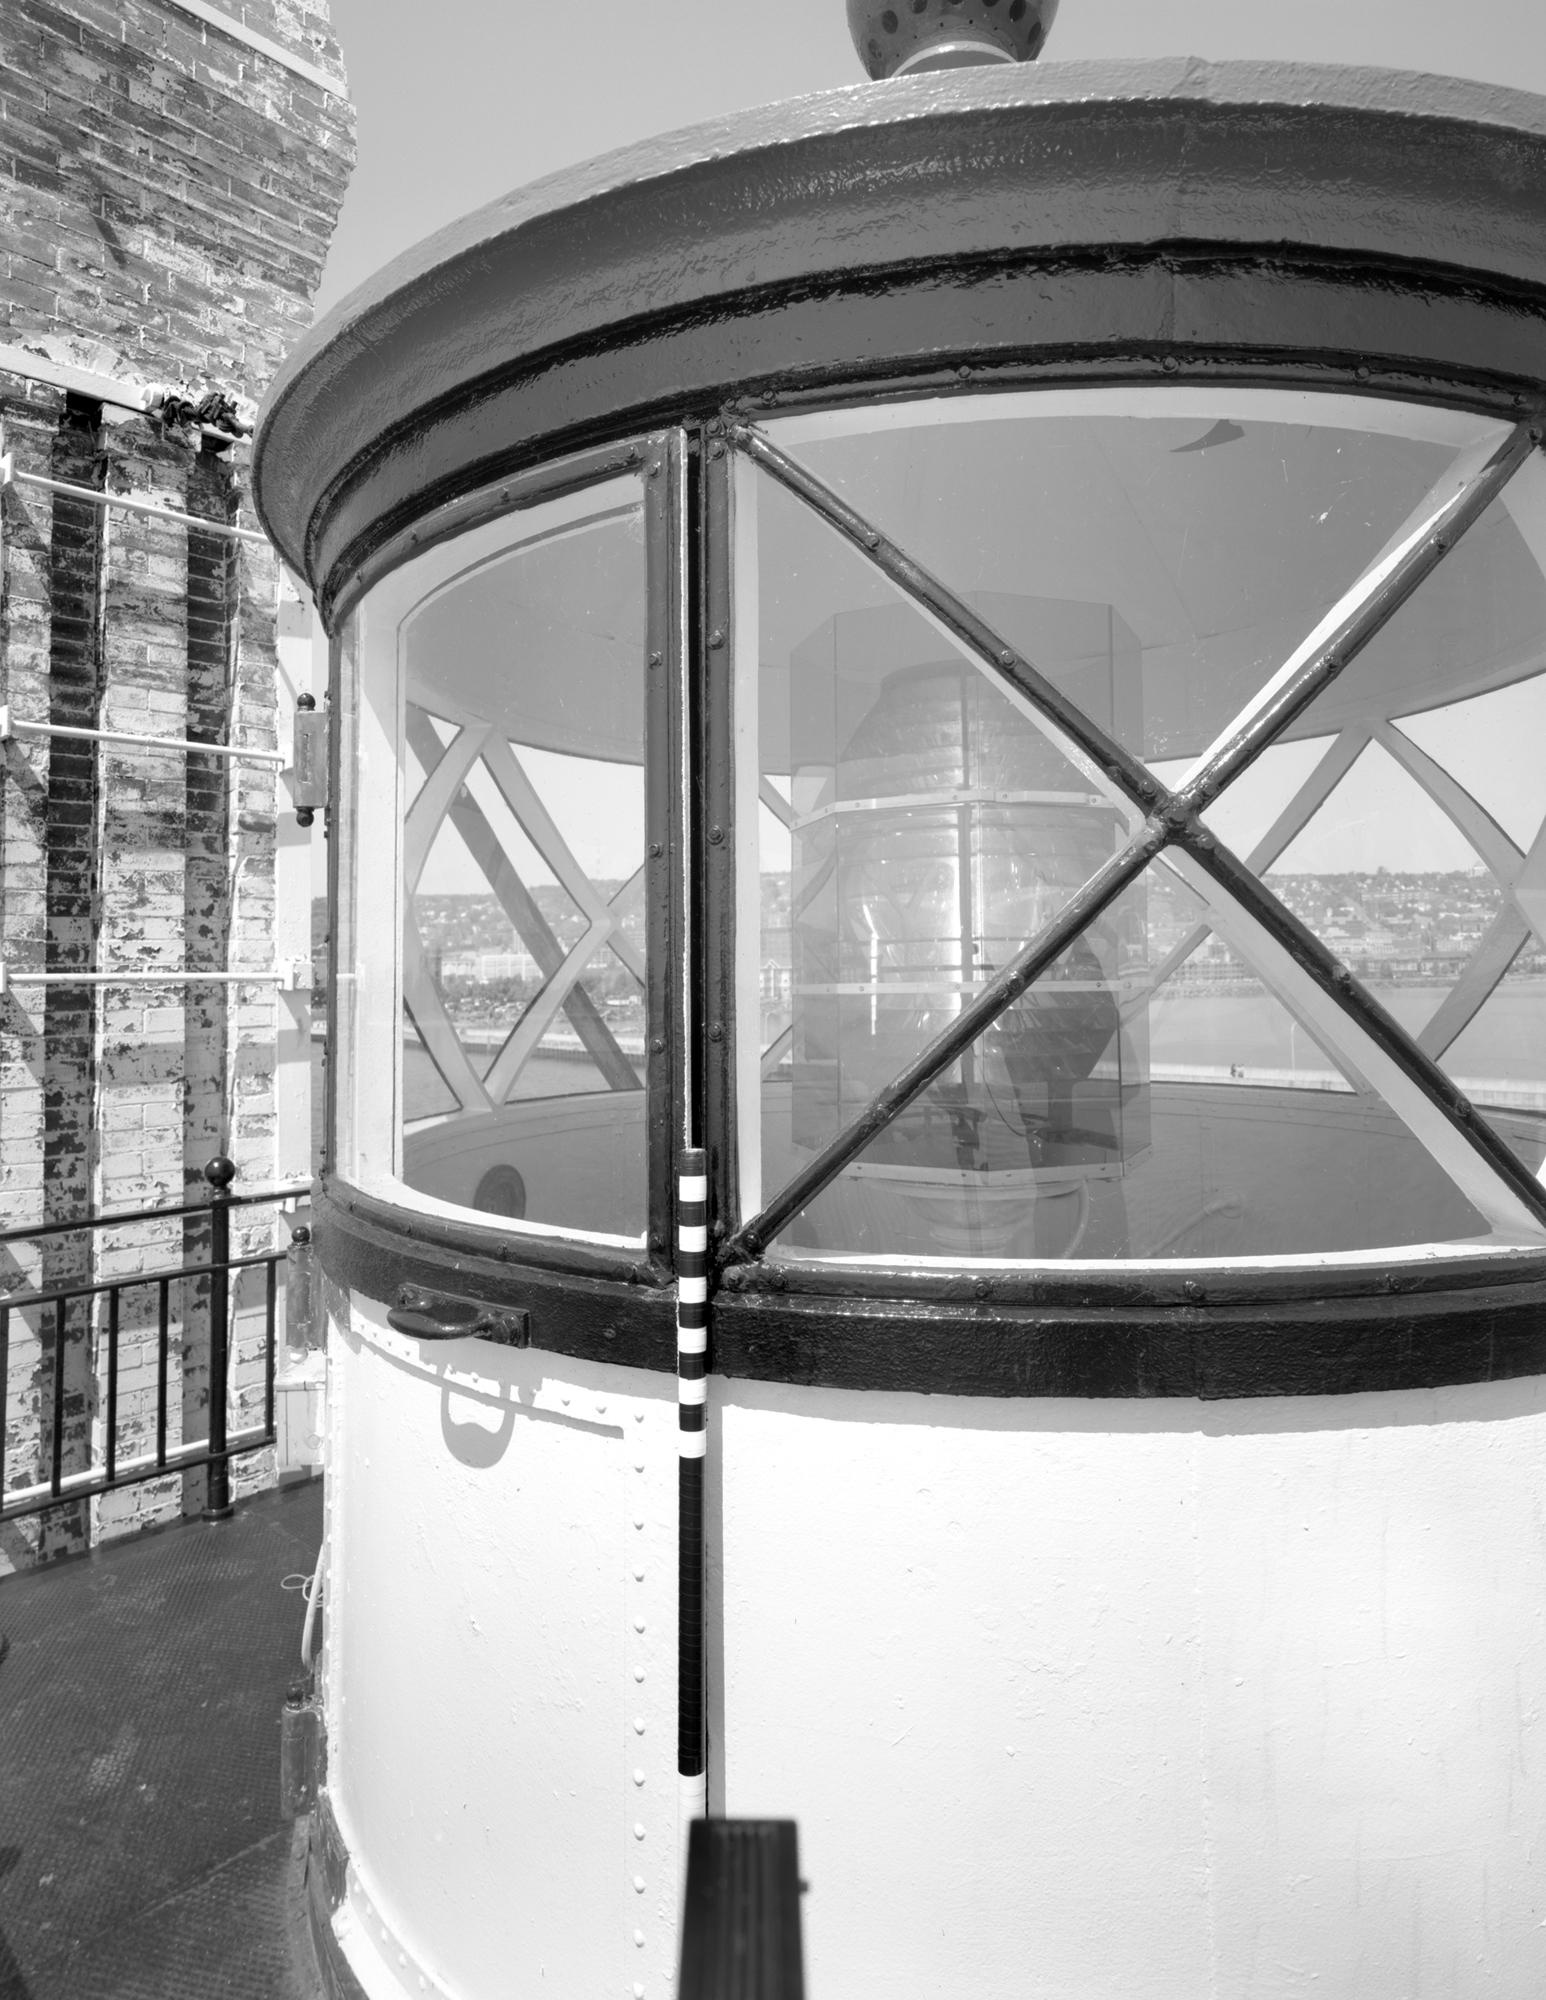 Lantern Exterior - MHPR SL-DUL-2003-04 (Please credit Daniel R. Pratt and the Minnesota Historic Property Record)